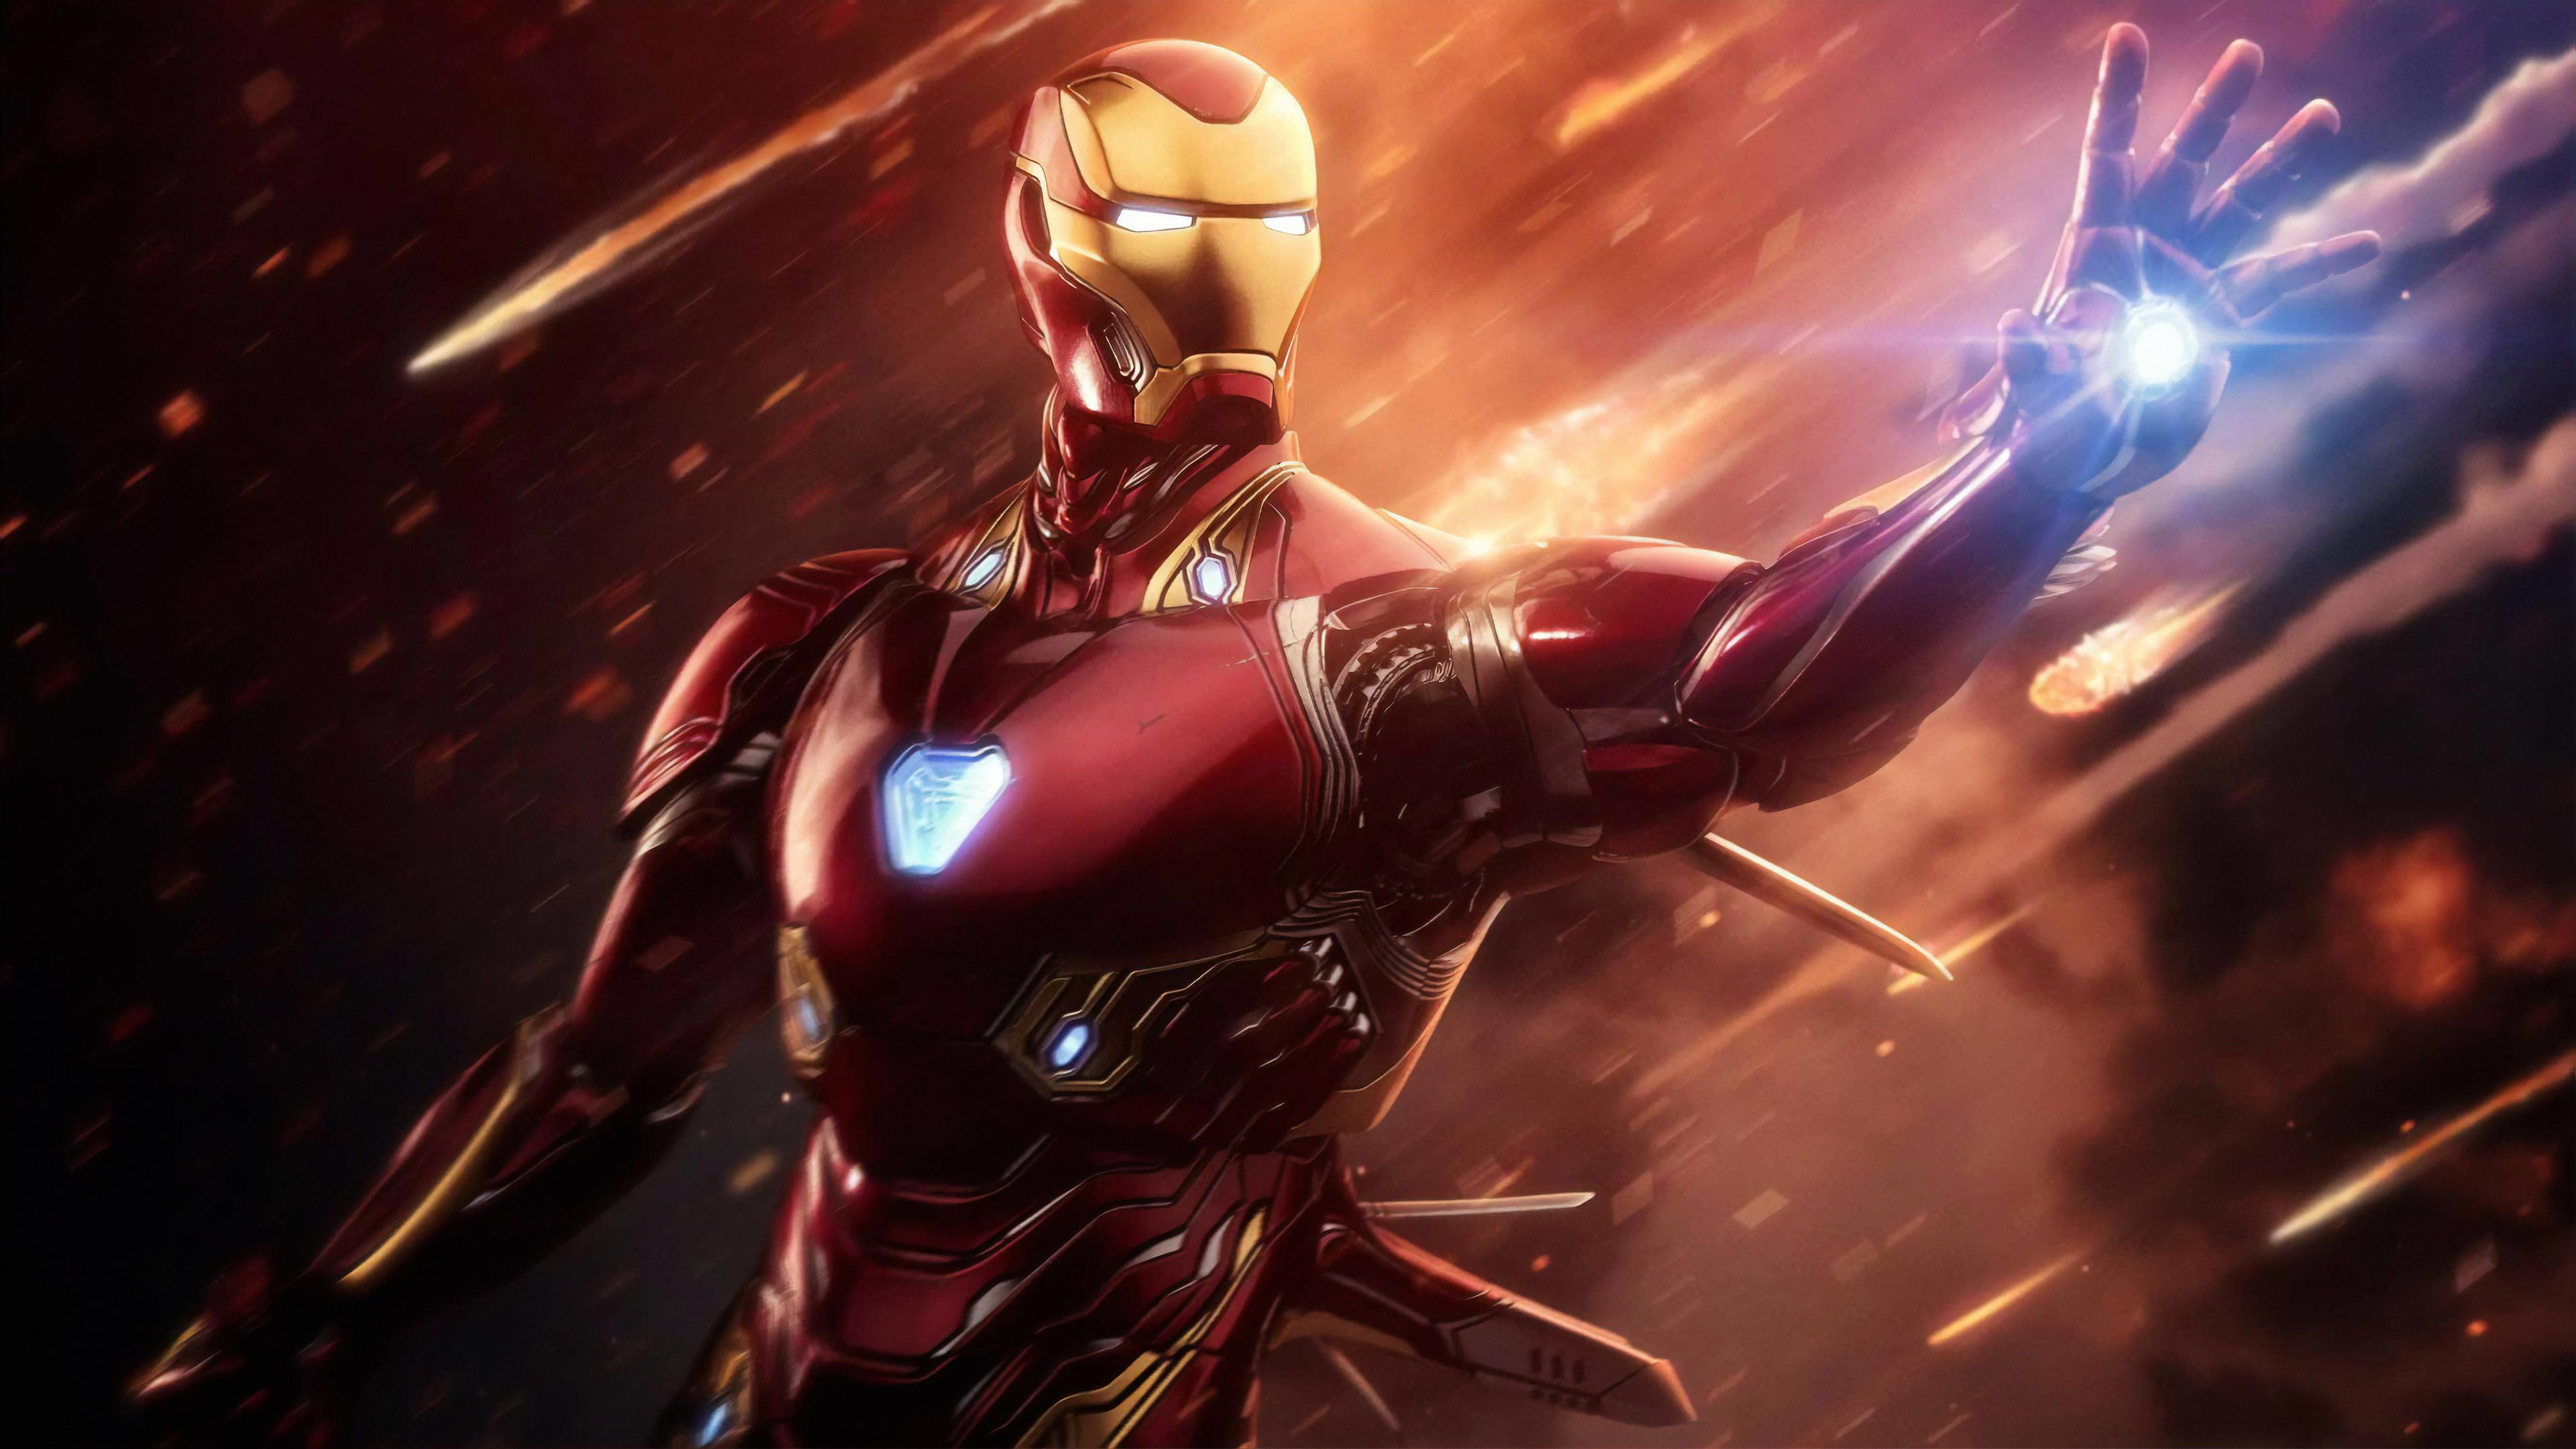 new iron man 2019 1565054188 - New Iron Man 2019 - superheroes wallpapers, iron man wallpapers, hd-wallpapers, 4k-wallpapers